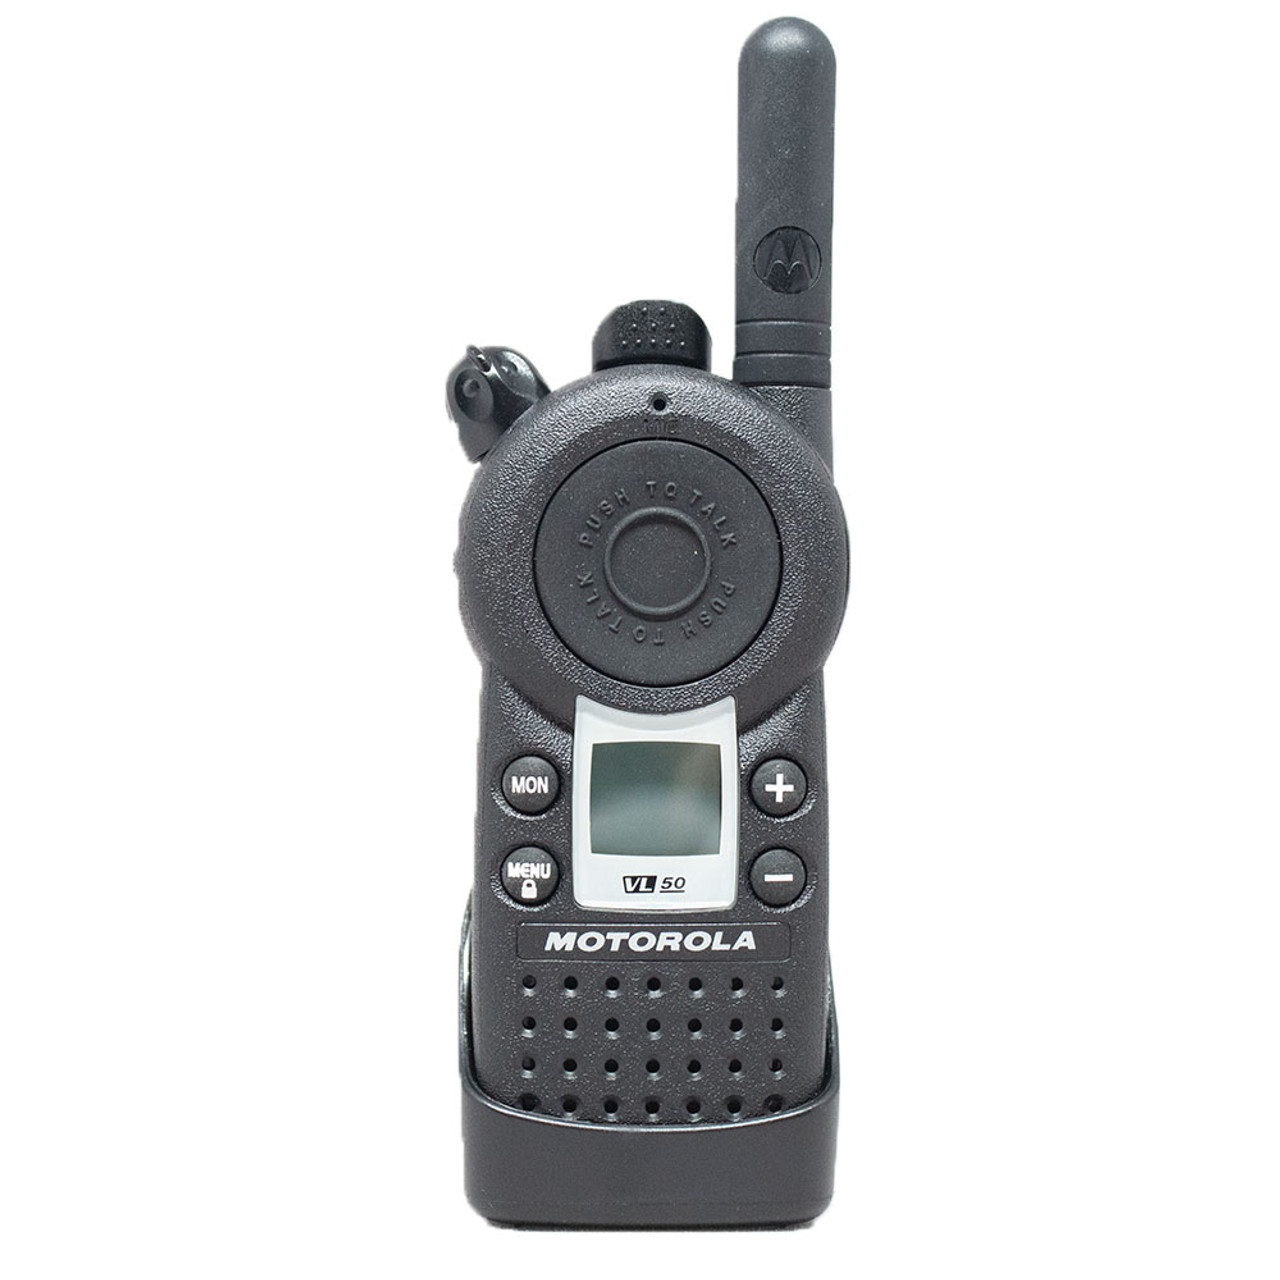 Motorola VL50 1 Watt 8 Channel UHF Business Two Way Radio